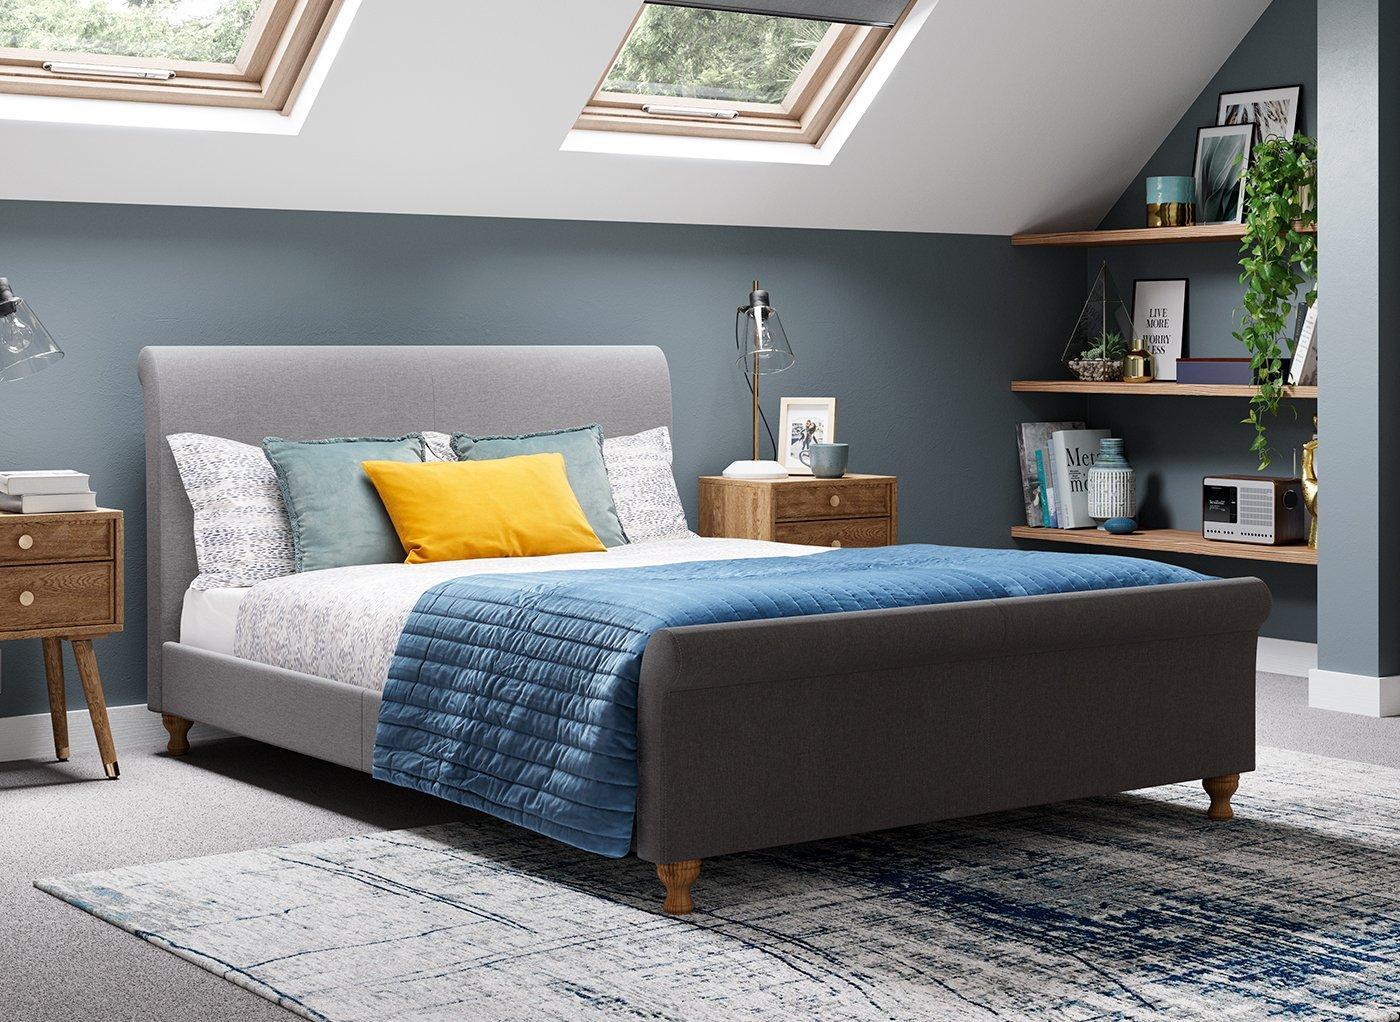 Marley Upholstered Low Rise Bed Frame (£249)